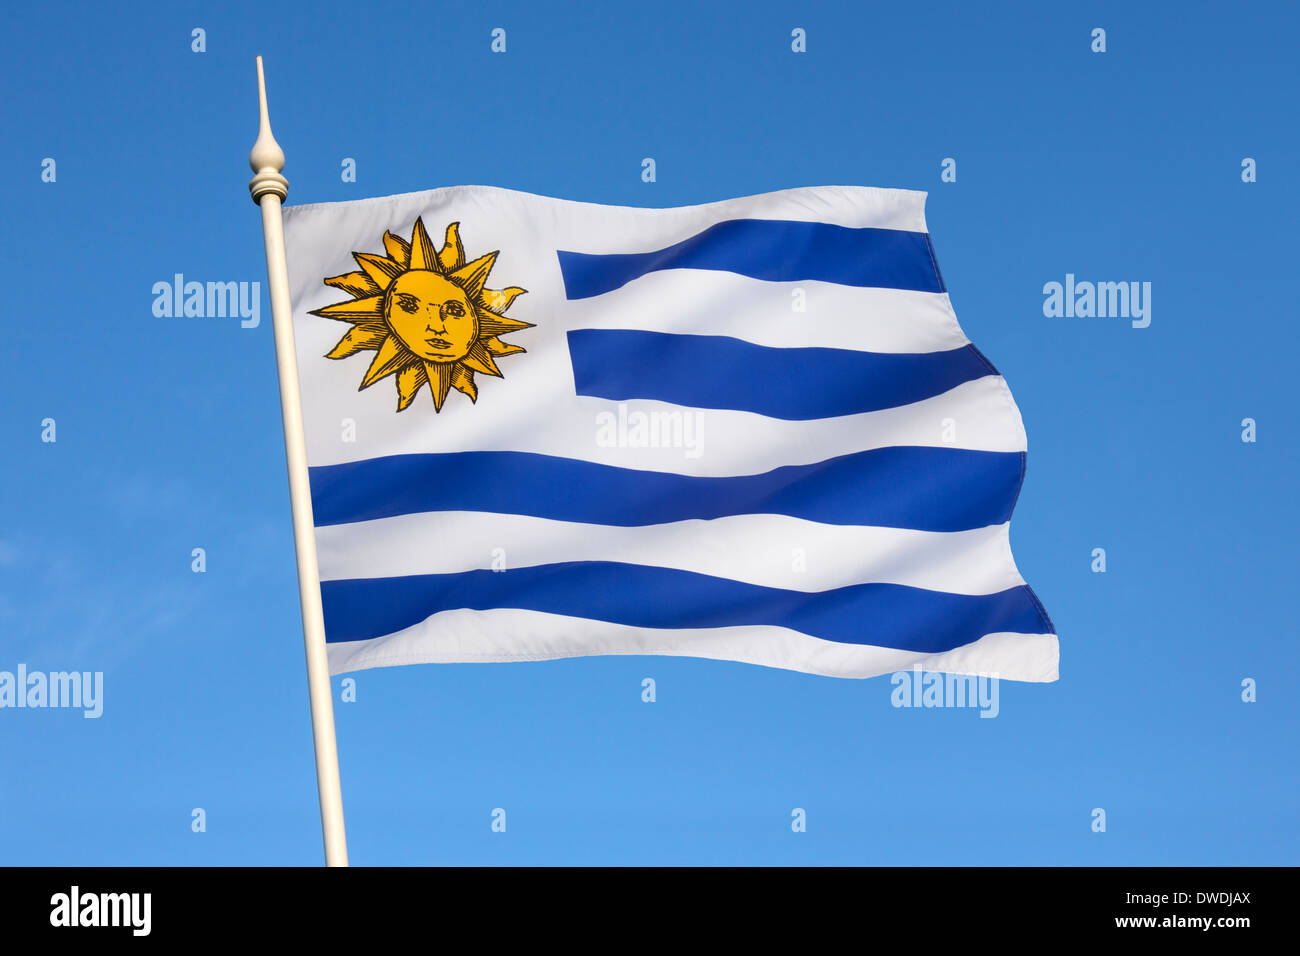 Le drapeau national de l'Uruguay Photo Stock